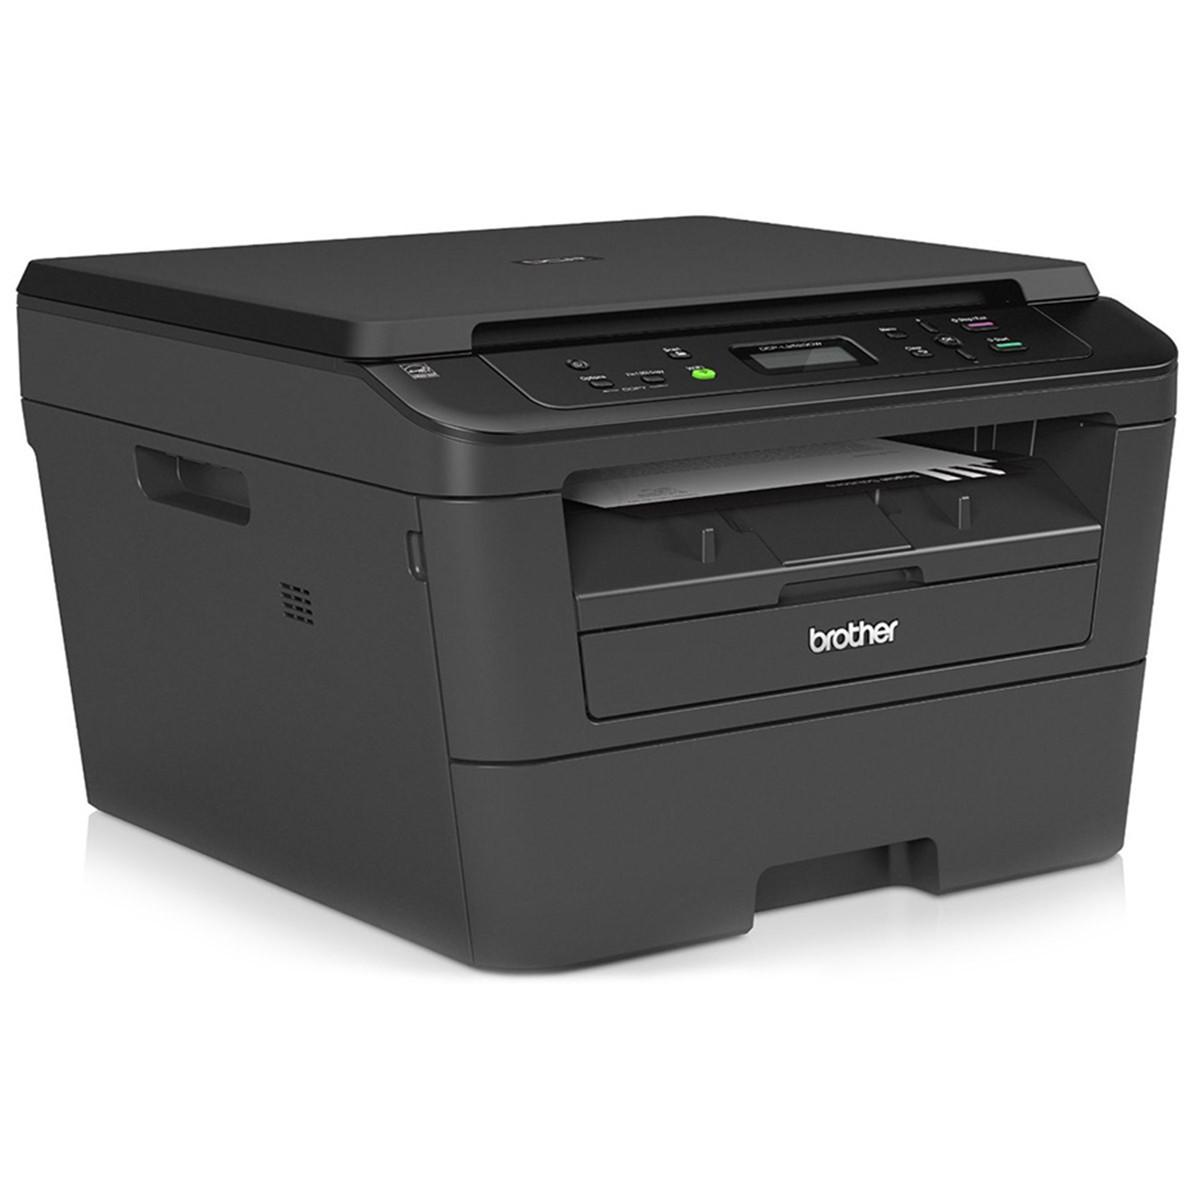 Impressora Brother DCP-L2520DW DCP-L2520 Multifuncional Laser Monocromática com Wireless e Duplex